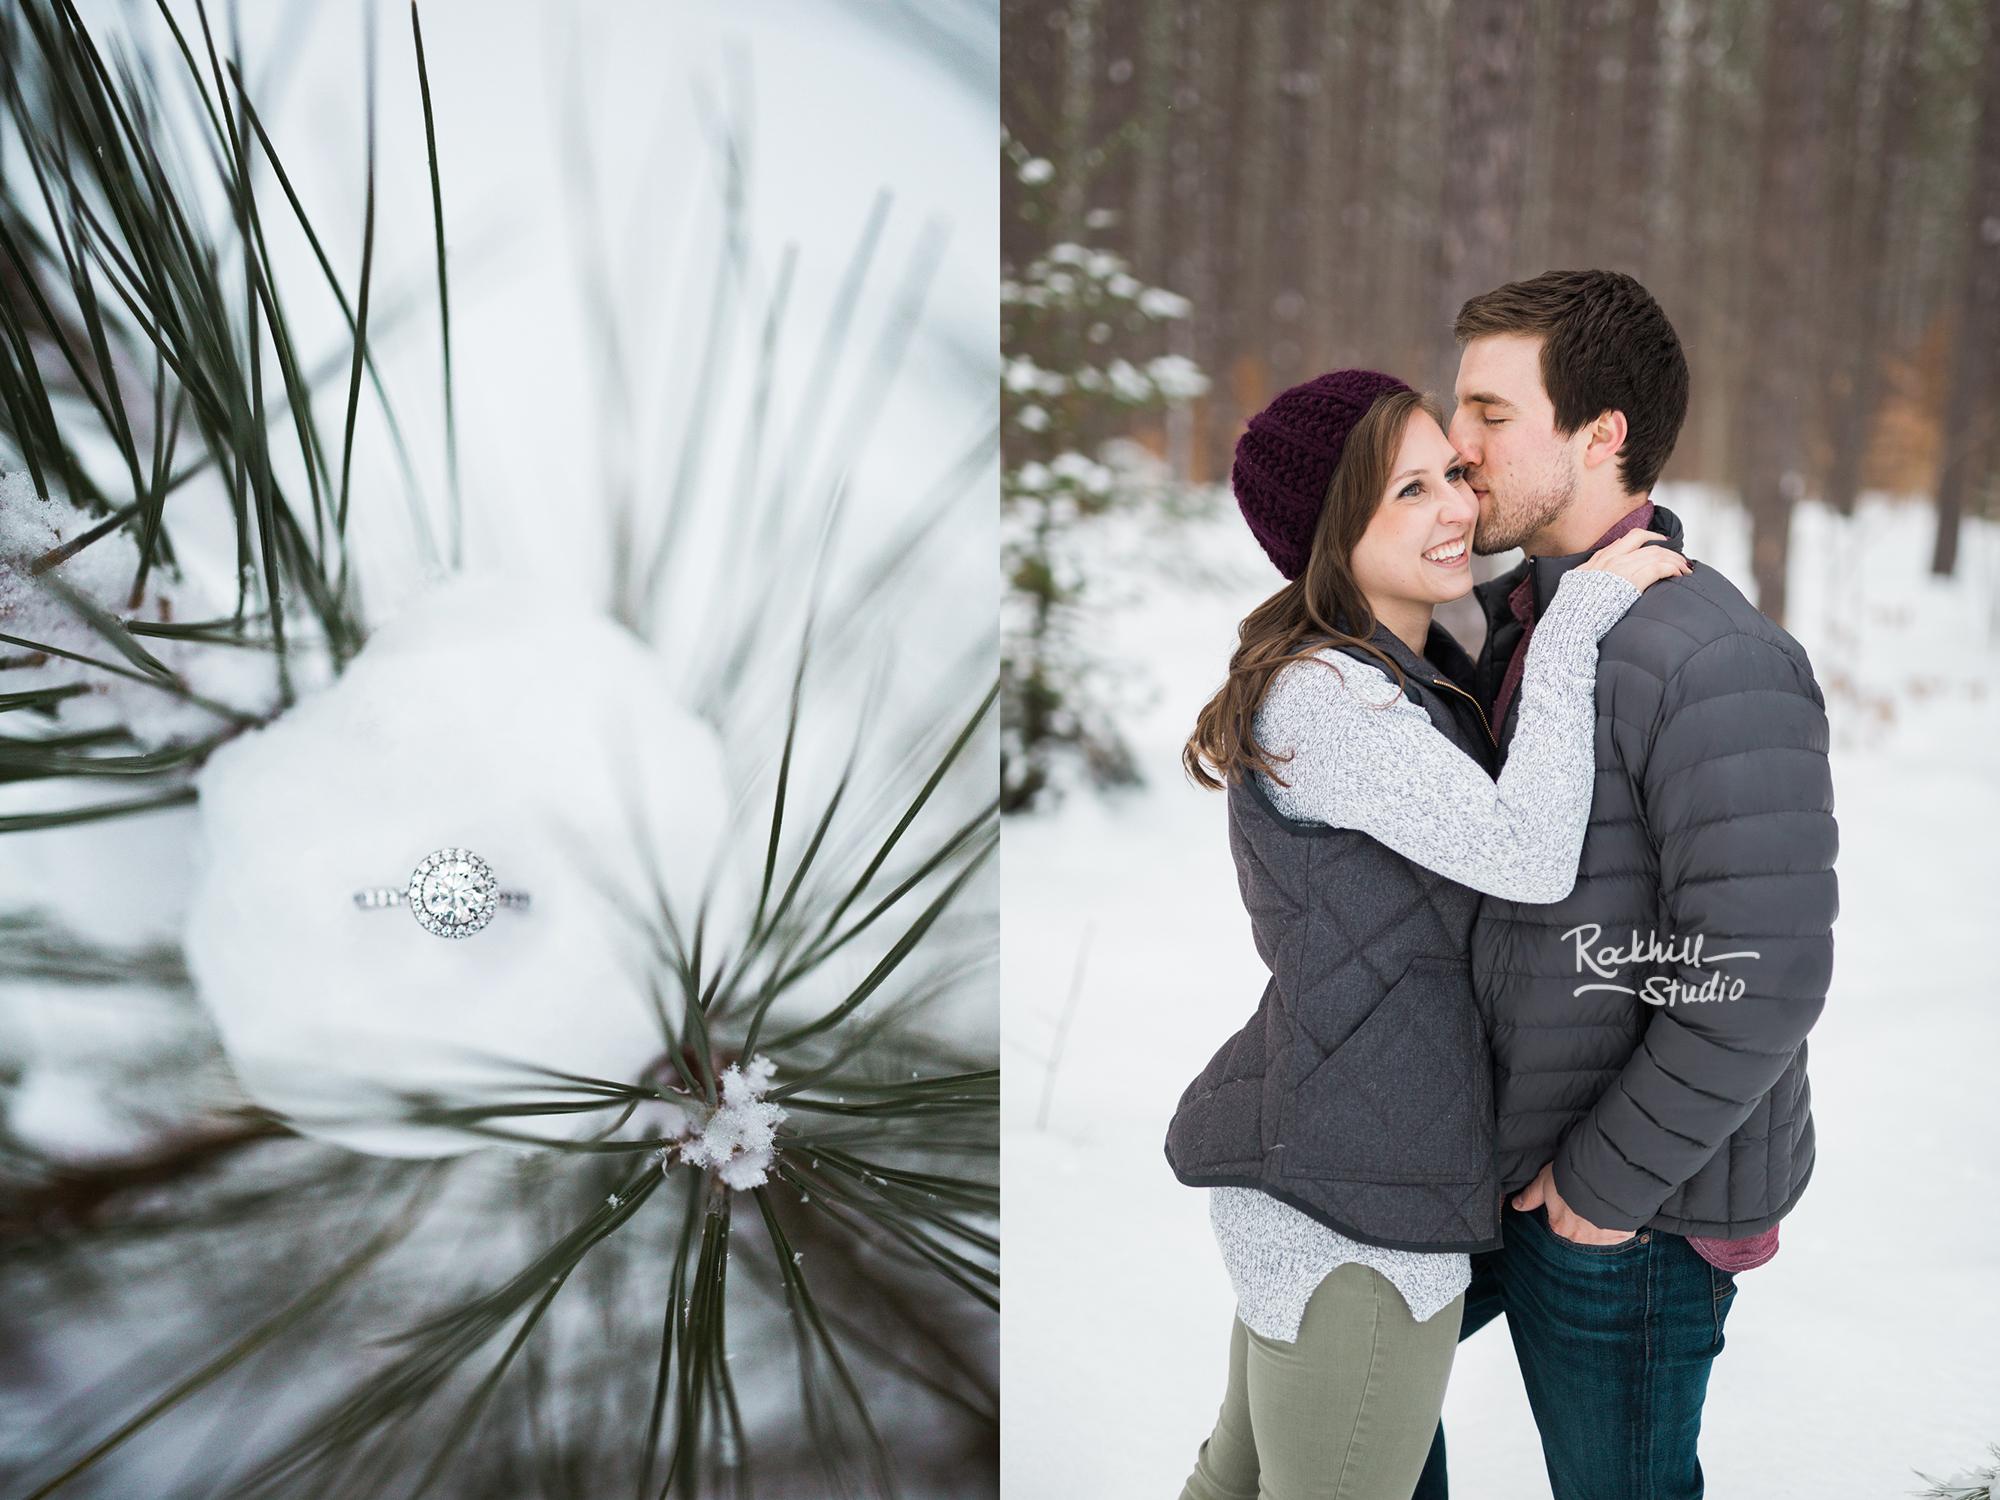 rockhill-studio-northern-michigan-engagement-photography-upper-peninsula-marquette-wedding-winter-28.jpg